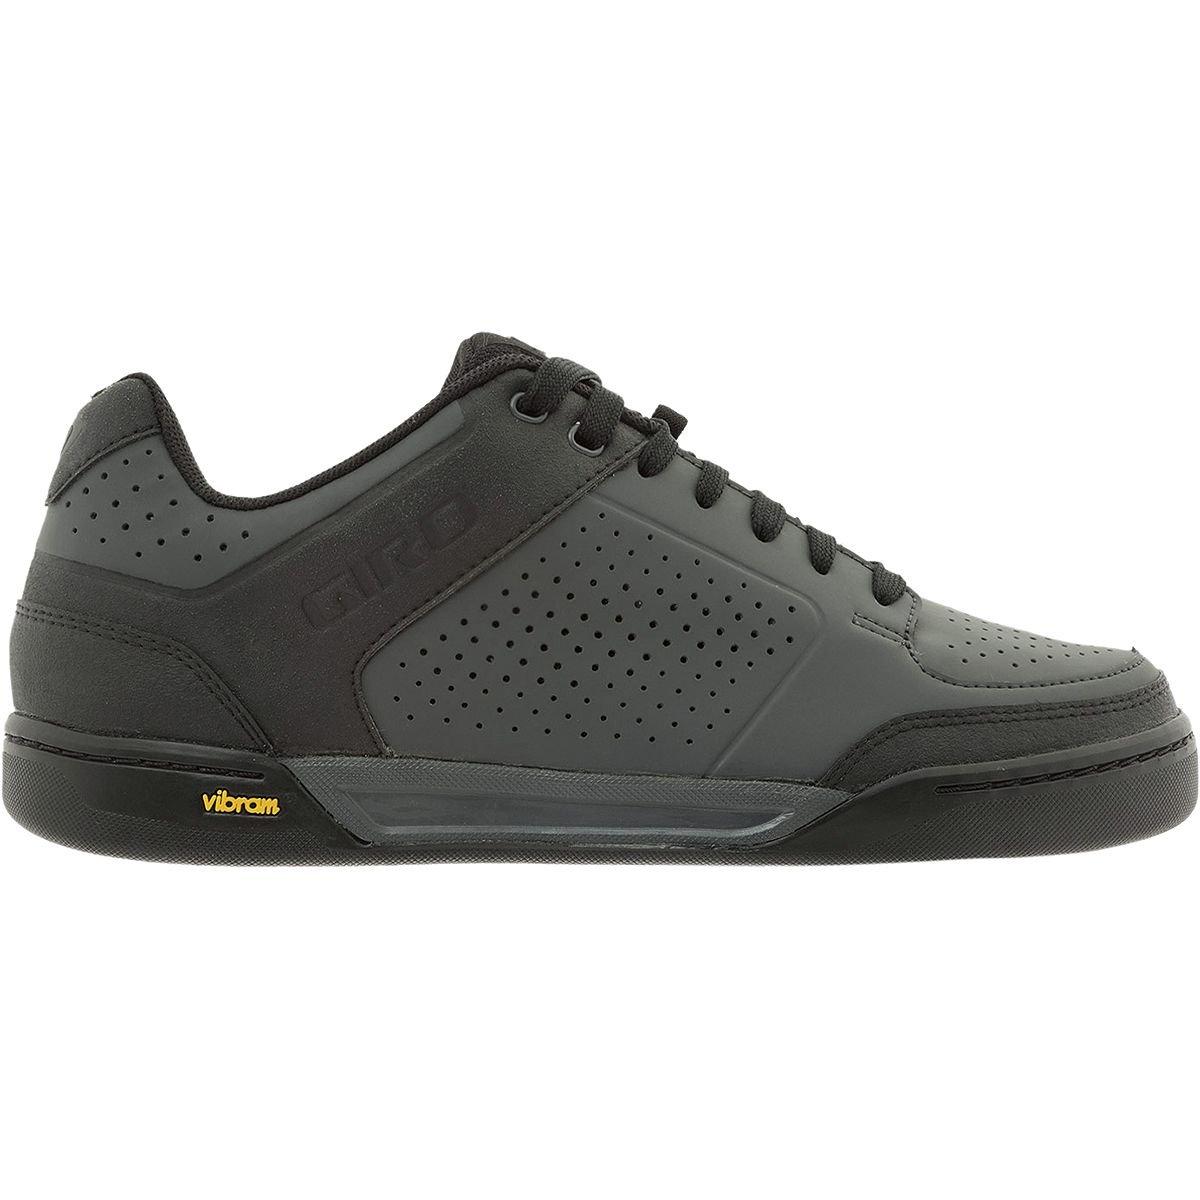 Giro Riddance Cycling Shoe - Men's B07CN5V3M2 45|Dark Shadow/Black